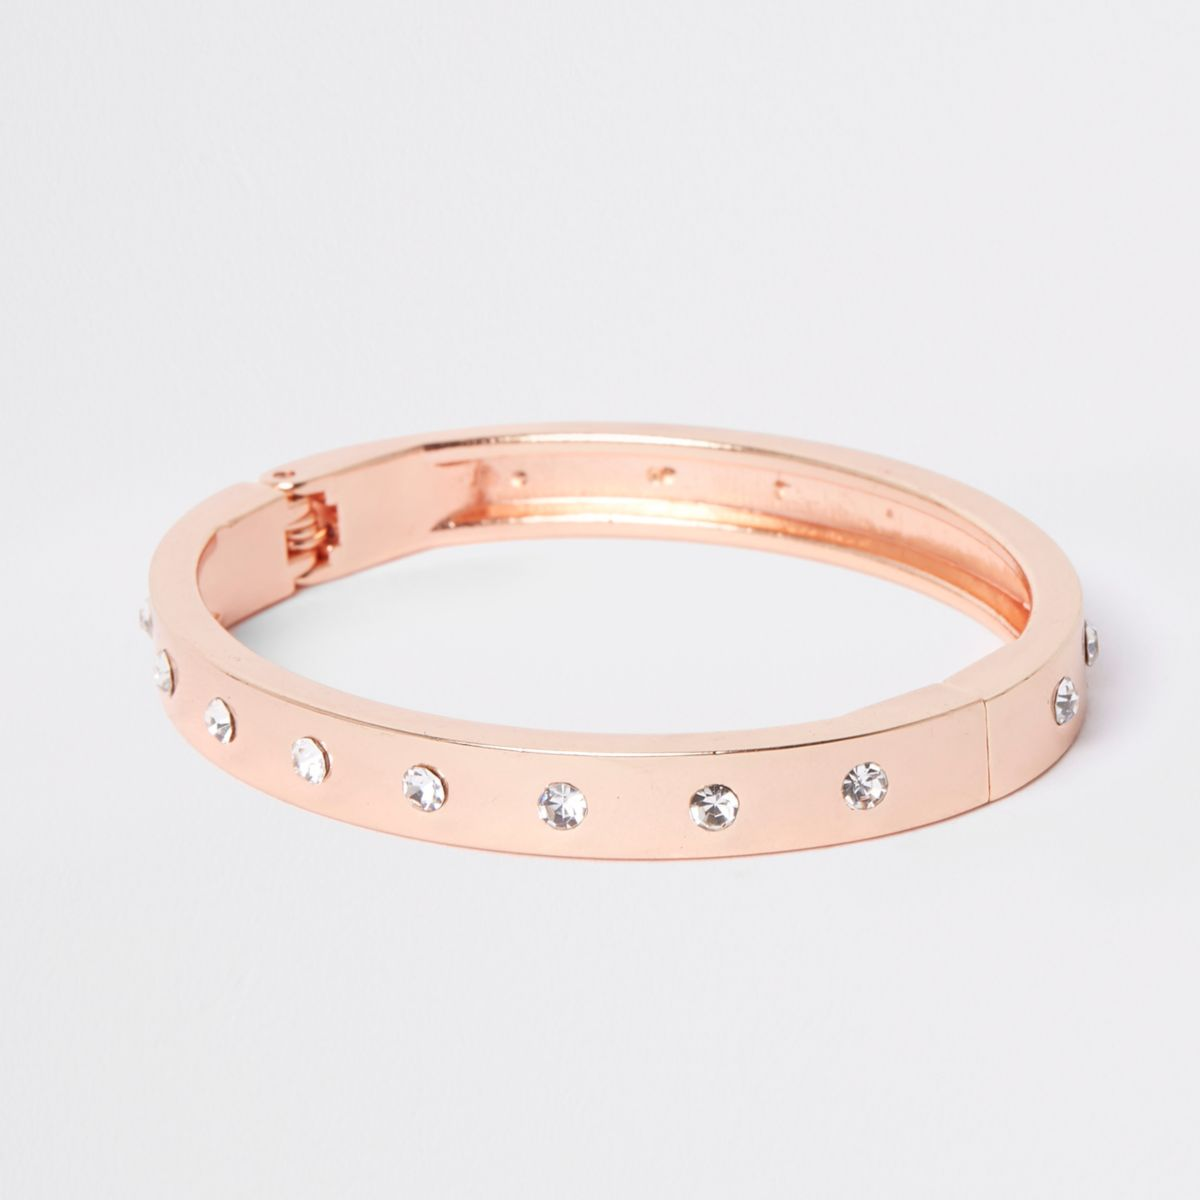 Rose gold tone diamante cuff bracelet